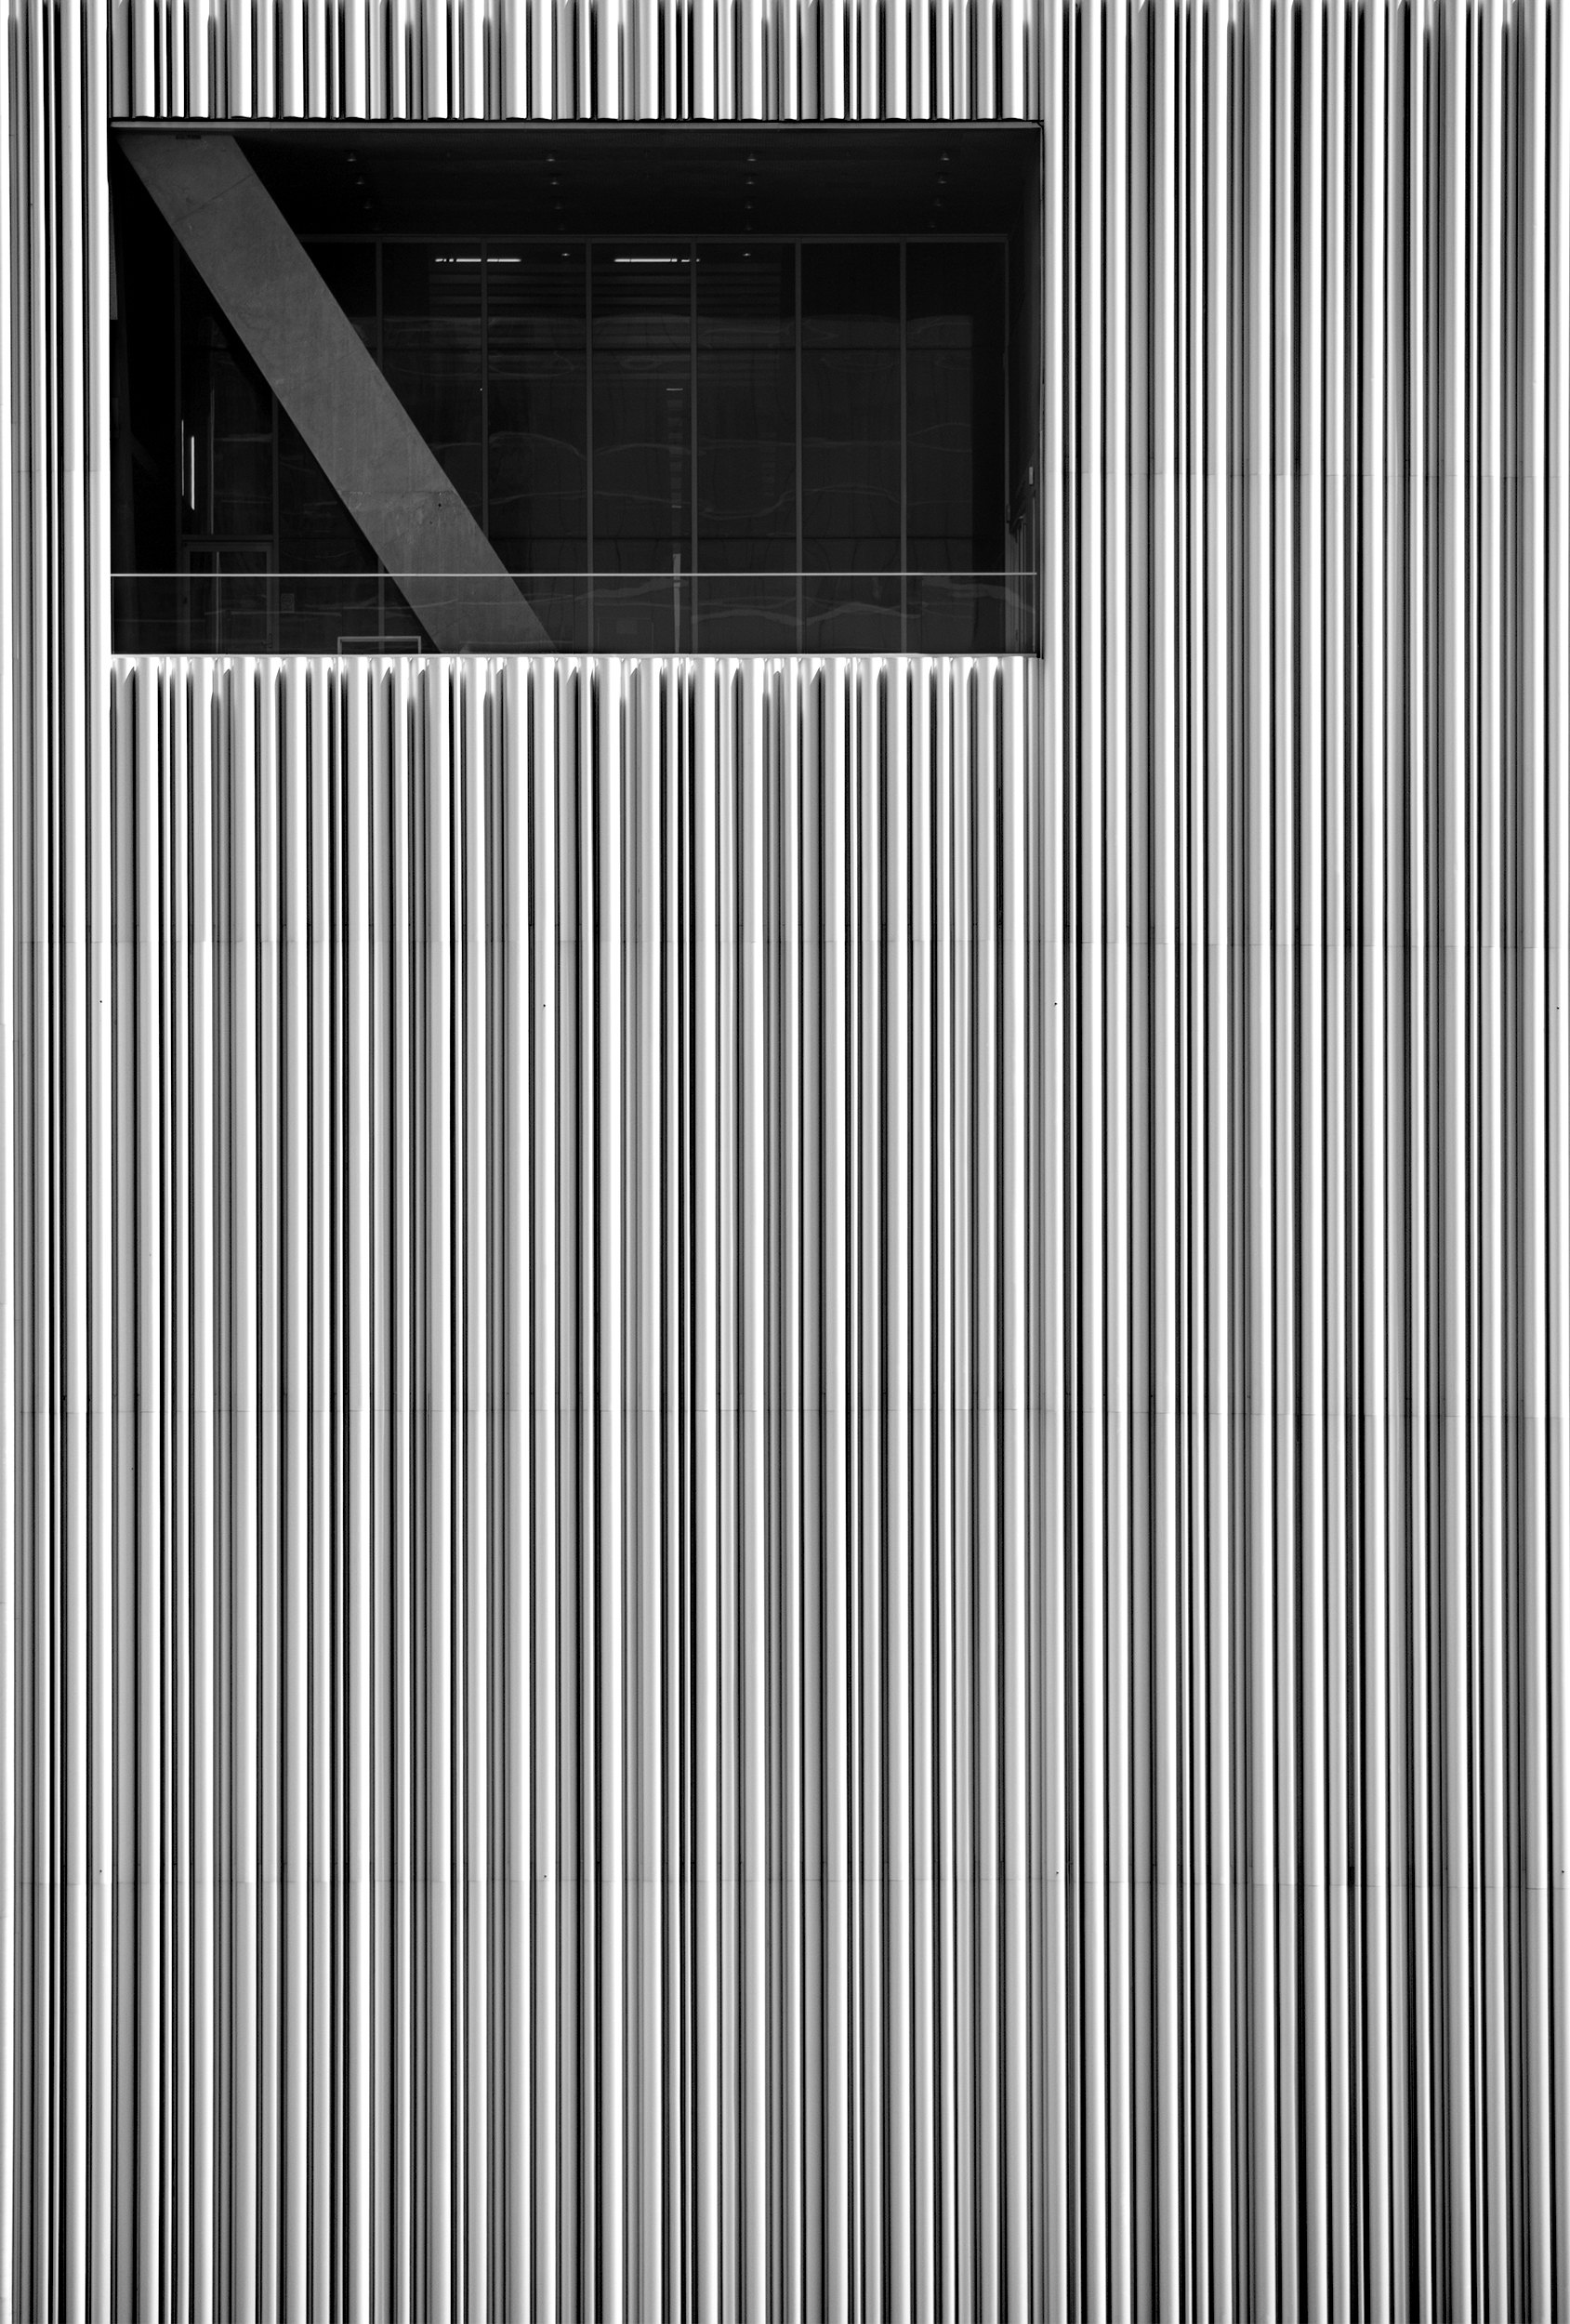 McElhaney_architecture_1.jpg